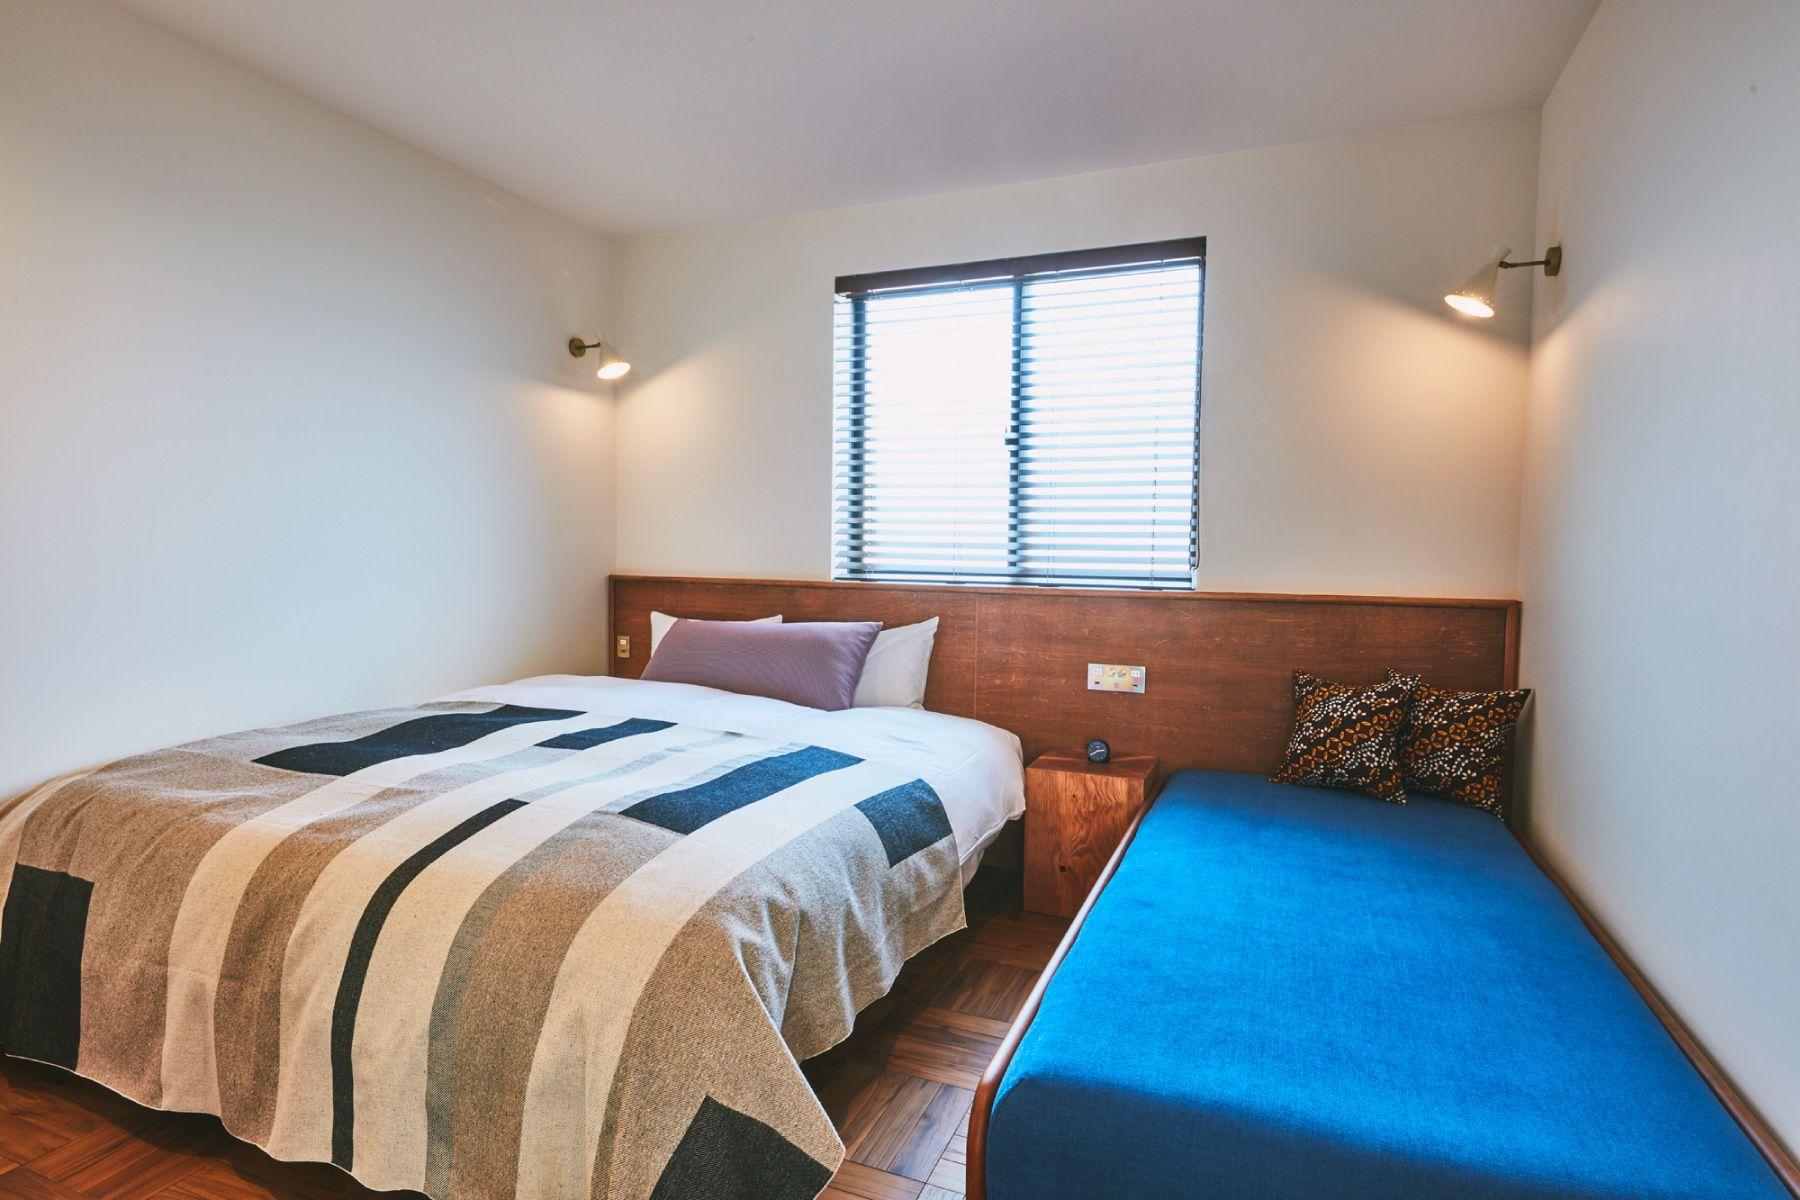 THE FLOW KAMAKURA (ザ フロウ カマクラ)KIRAベッドルーム/キングサイズベッド